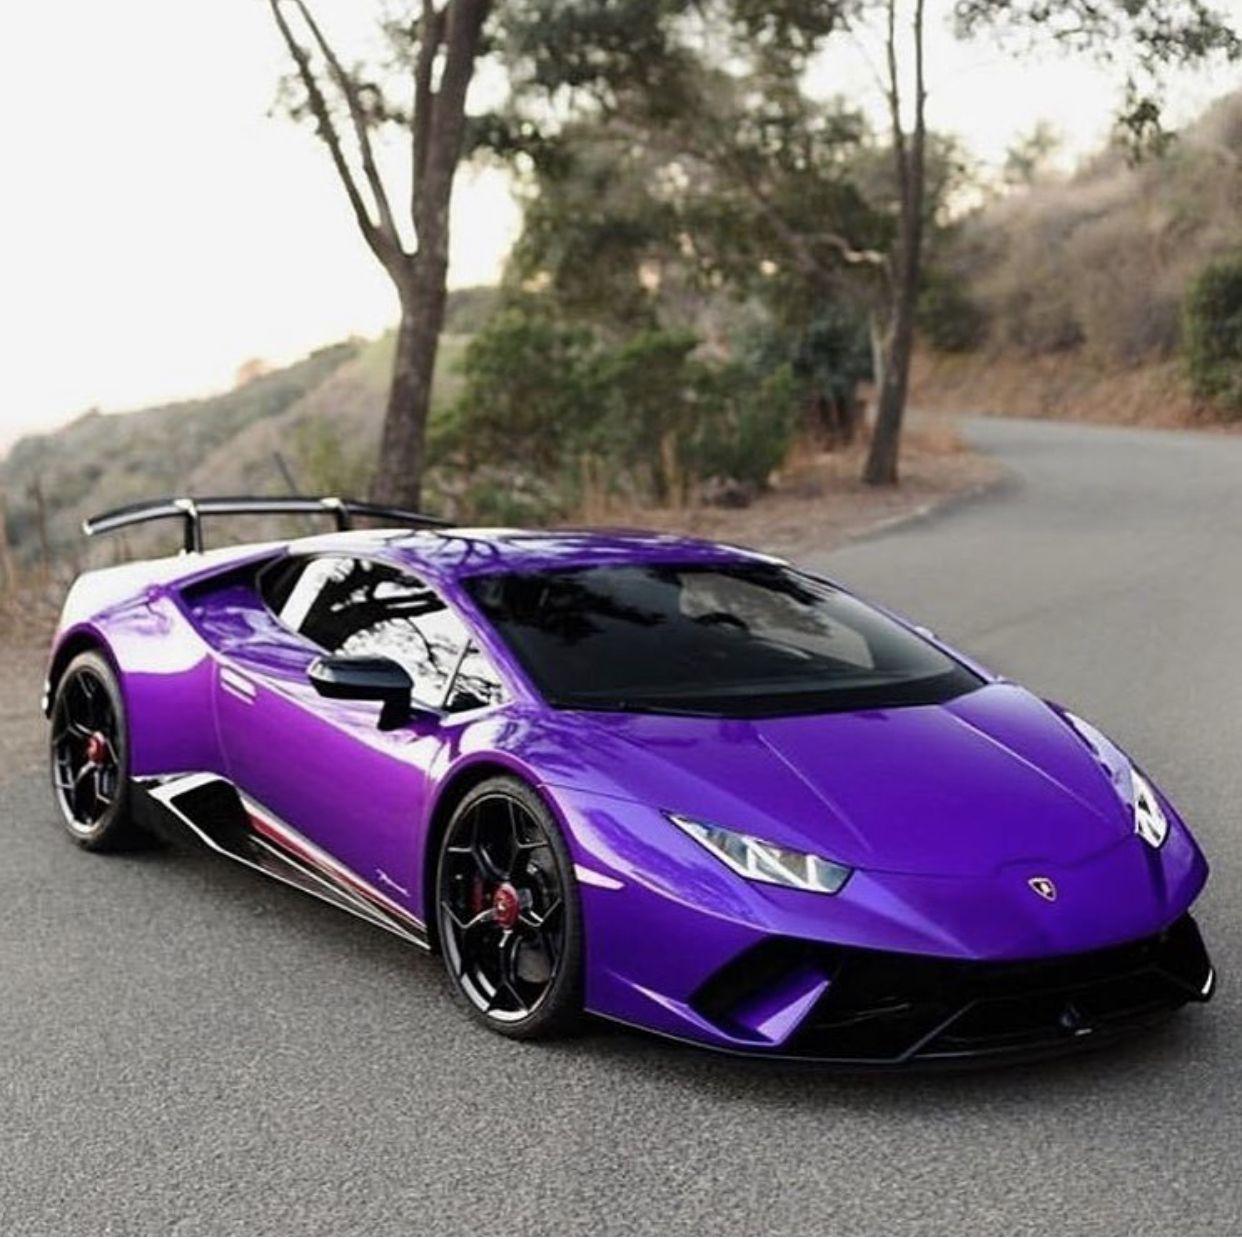 Best Luxury Cars 2020 In 2020 Best Luxury Cars Super Cars Top Luxury Cars